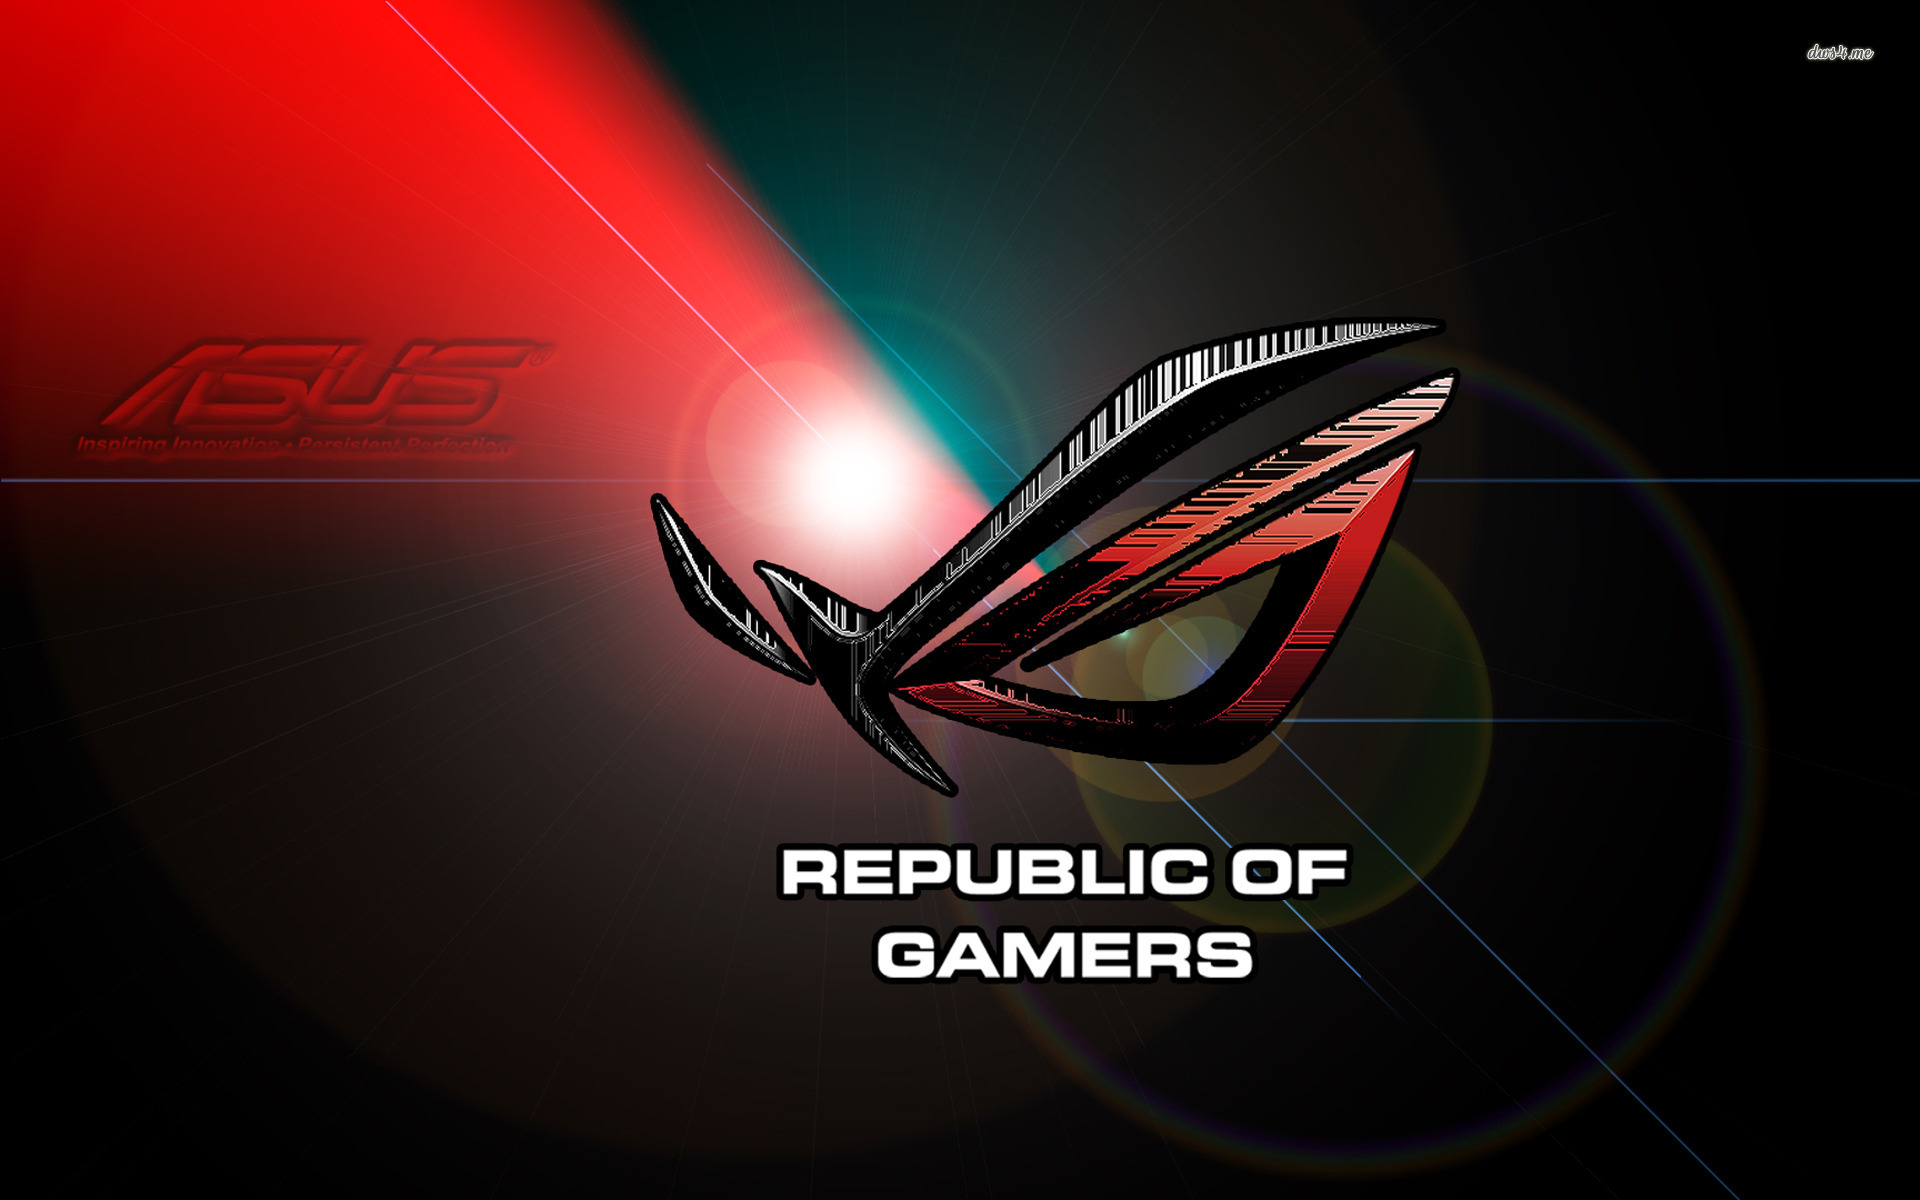 Republic of Gamers wallpaper   Computer wallpapers   3914 1920x1200